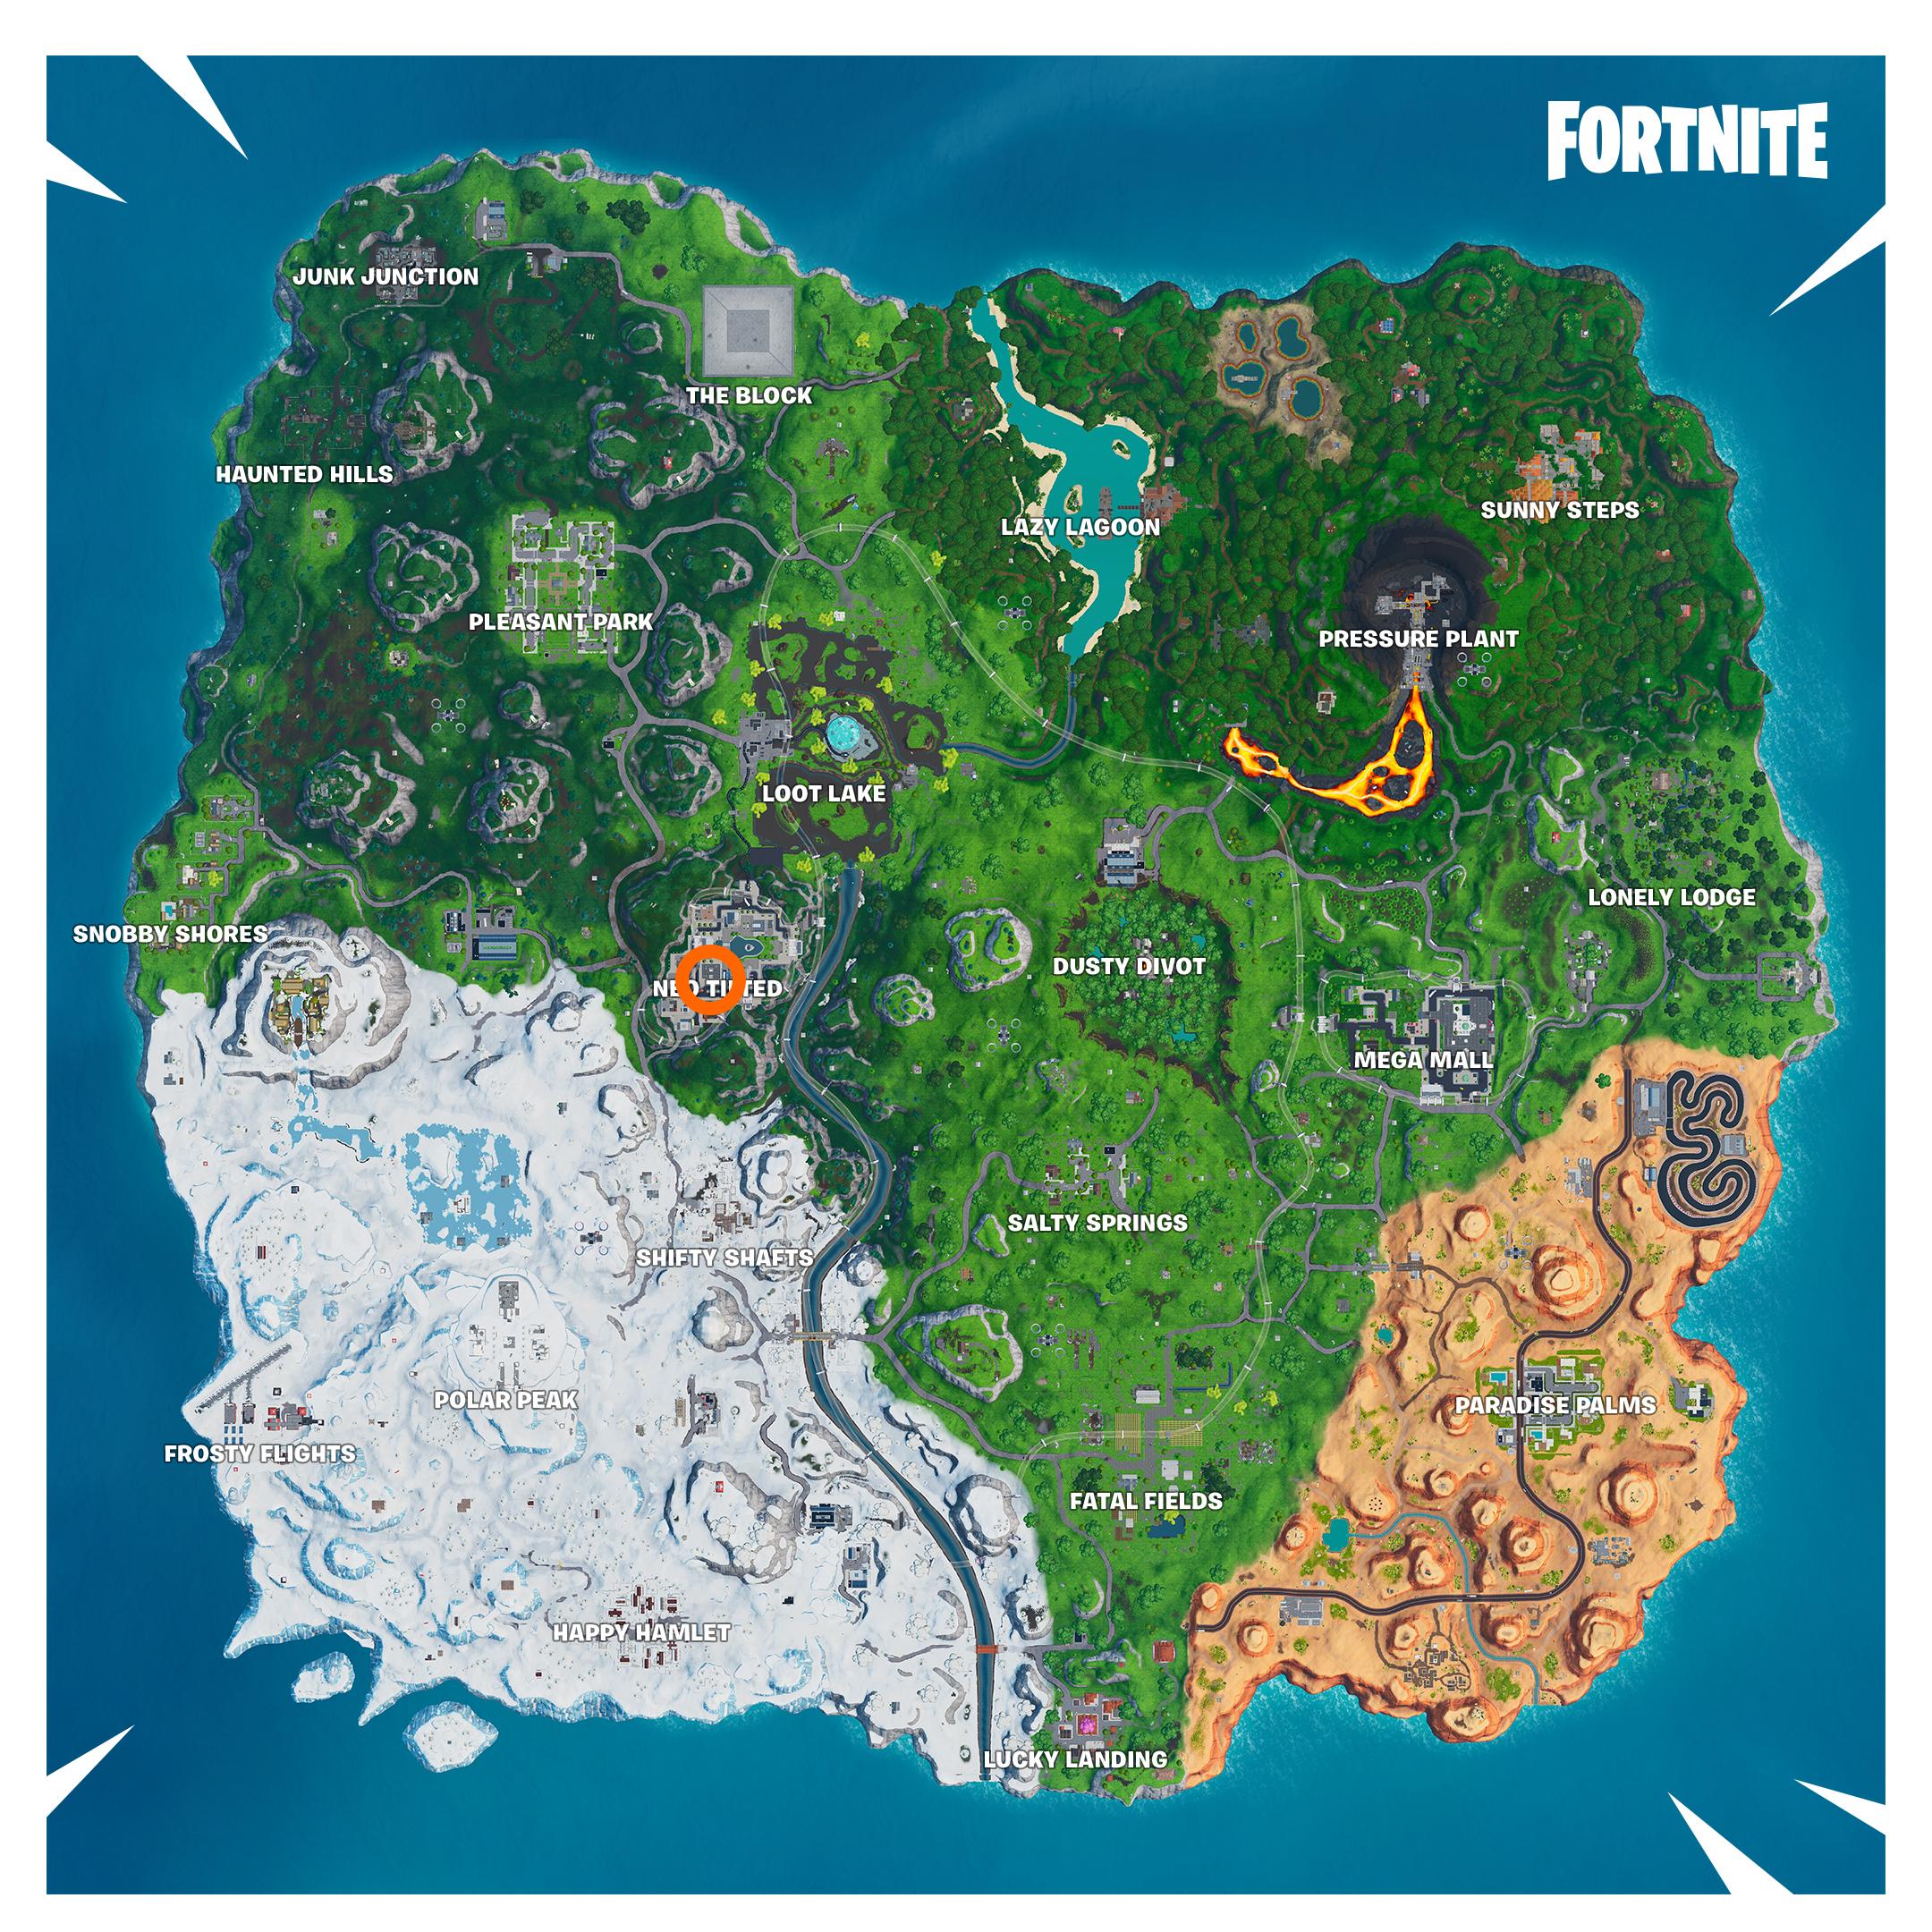 Fortnite Fortbyte 41 siti